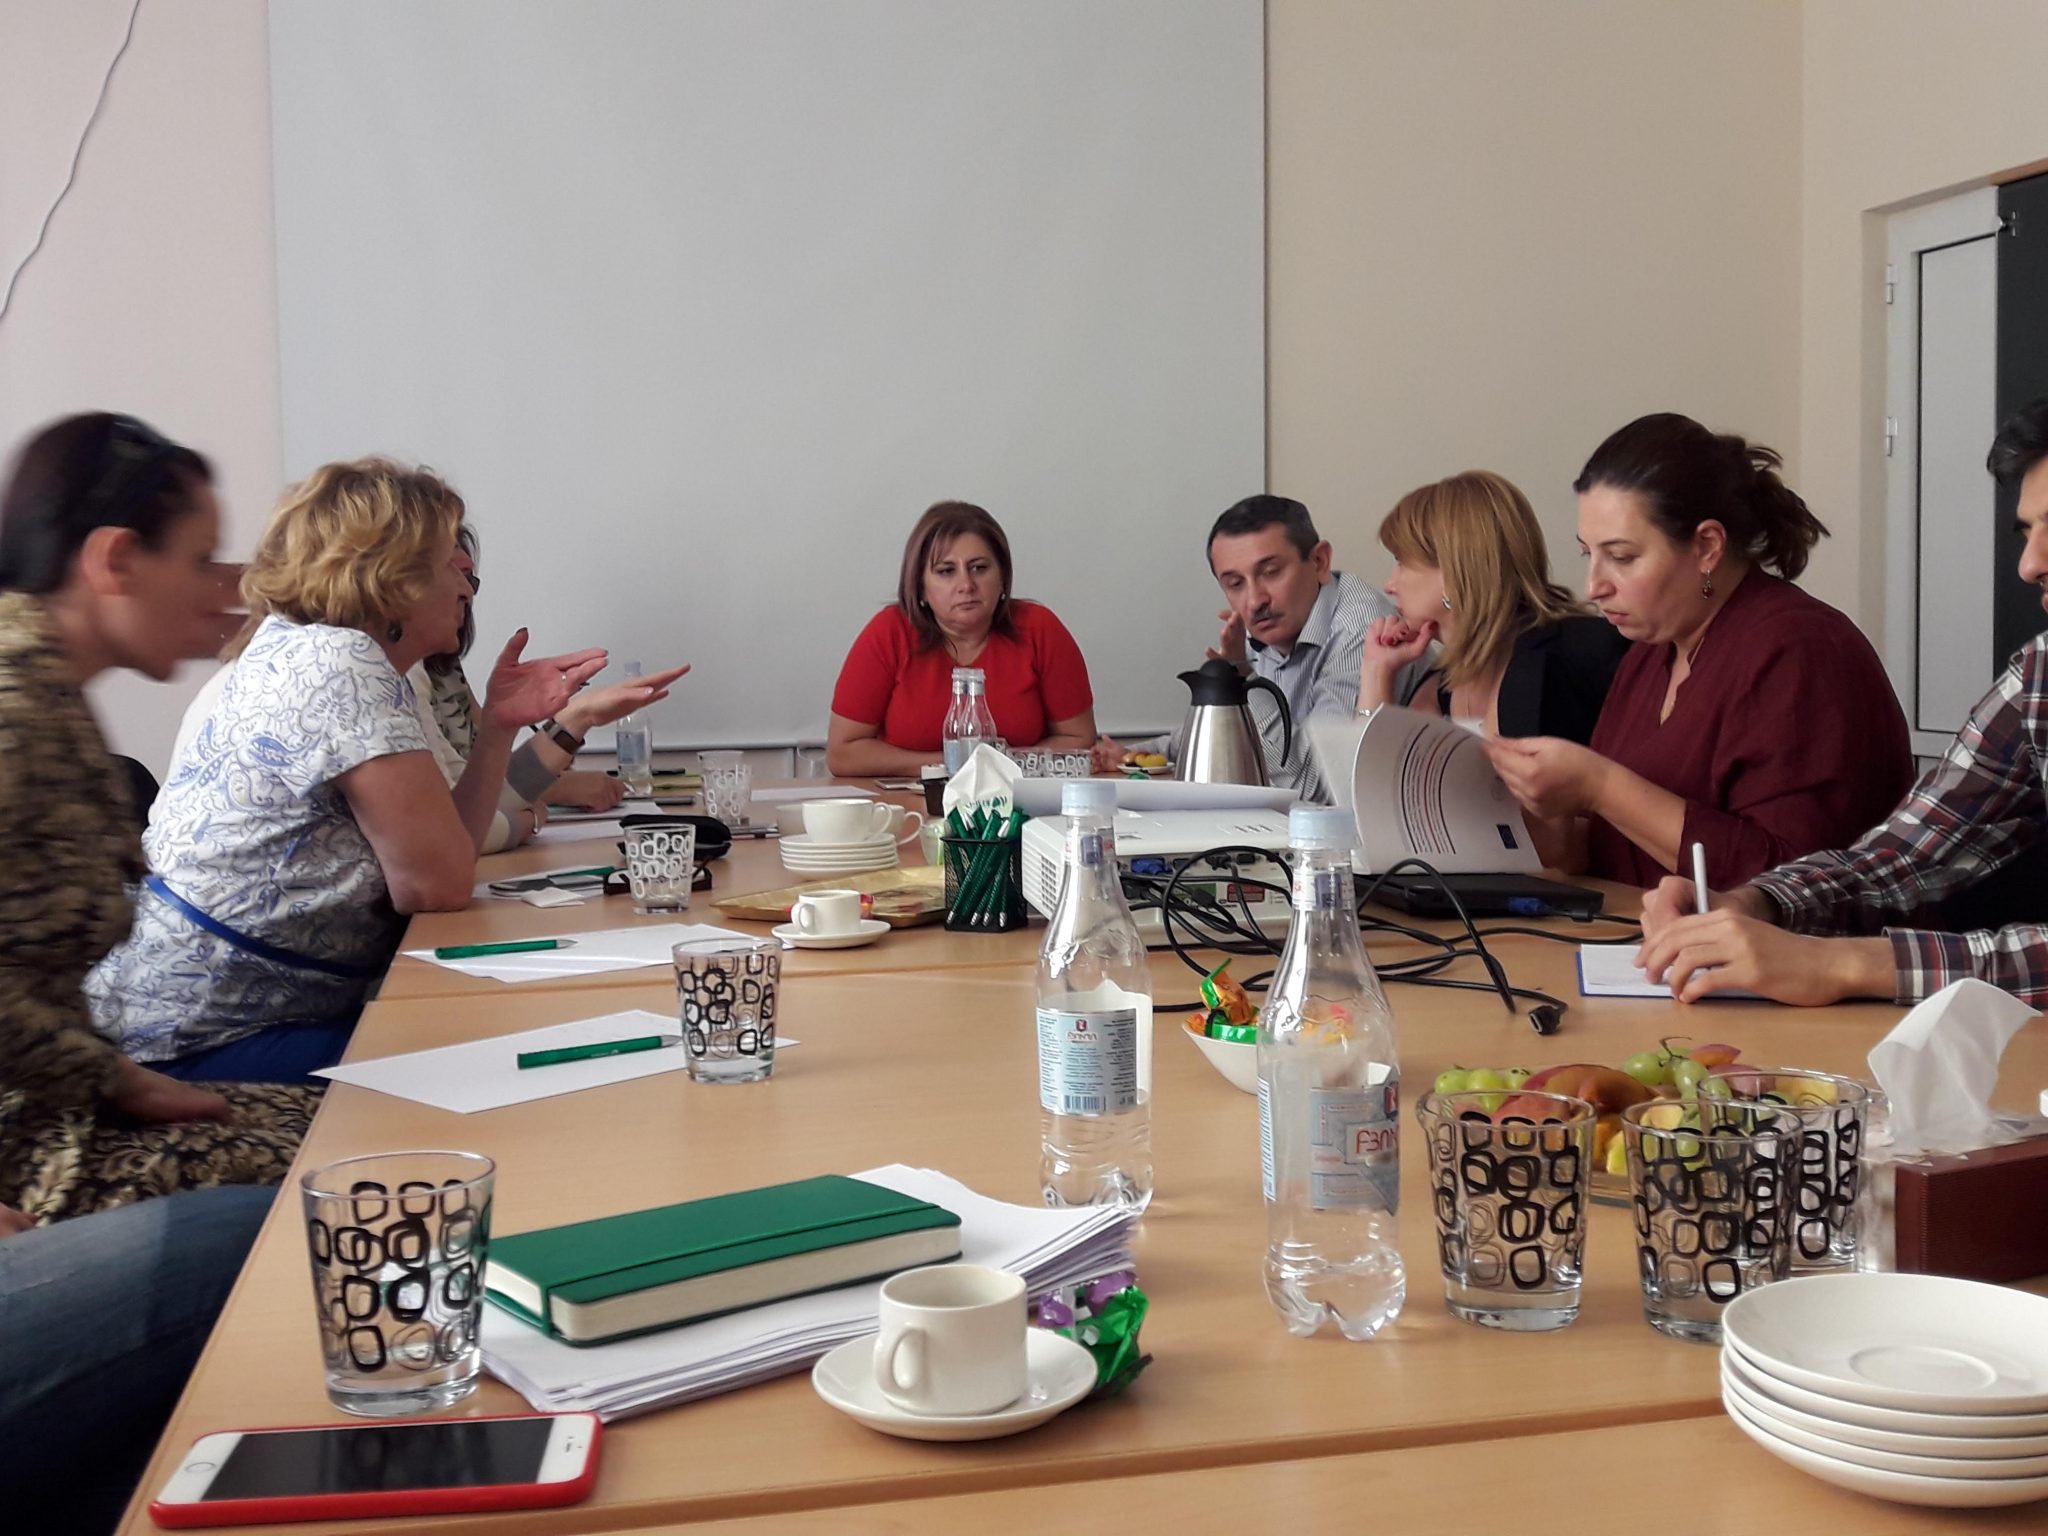 Focus group discussion in Armenia